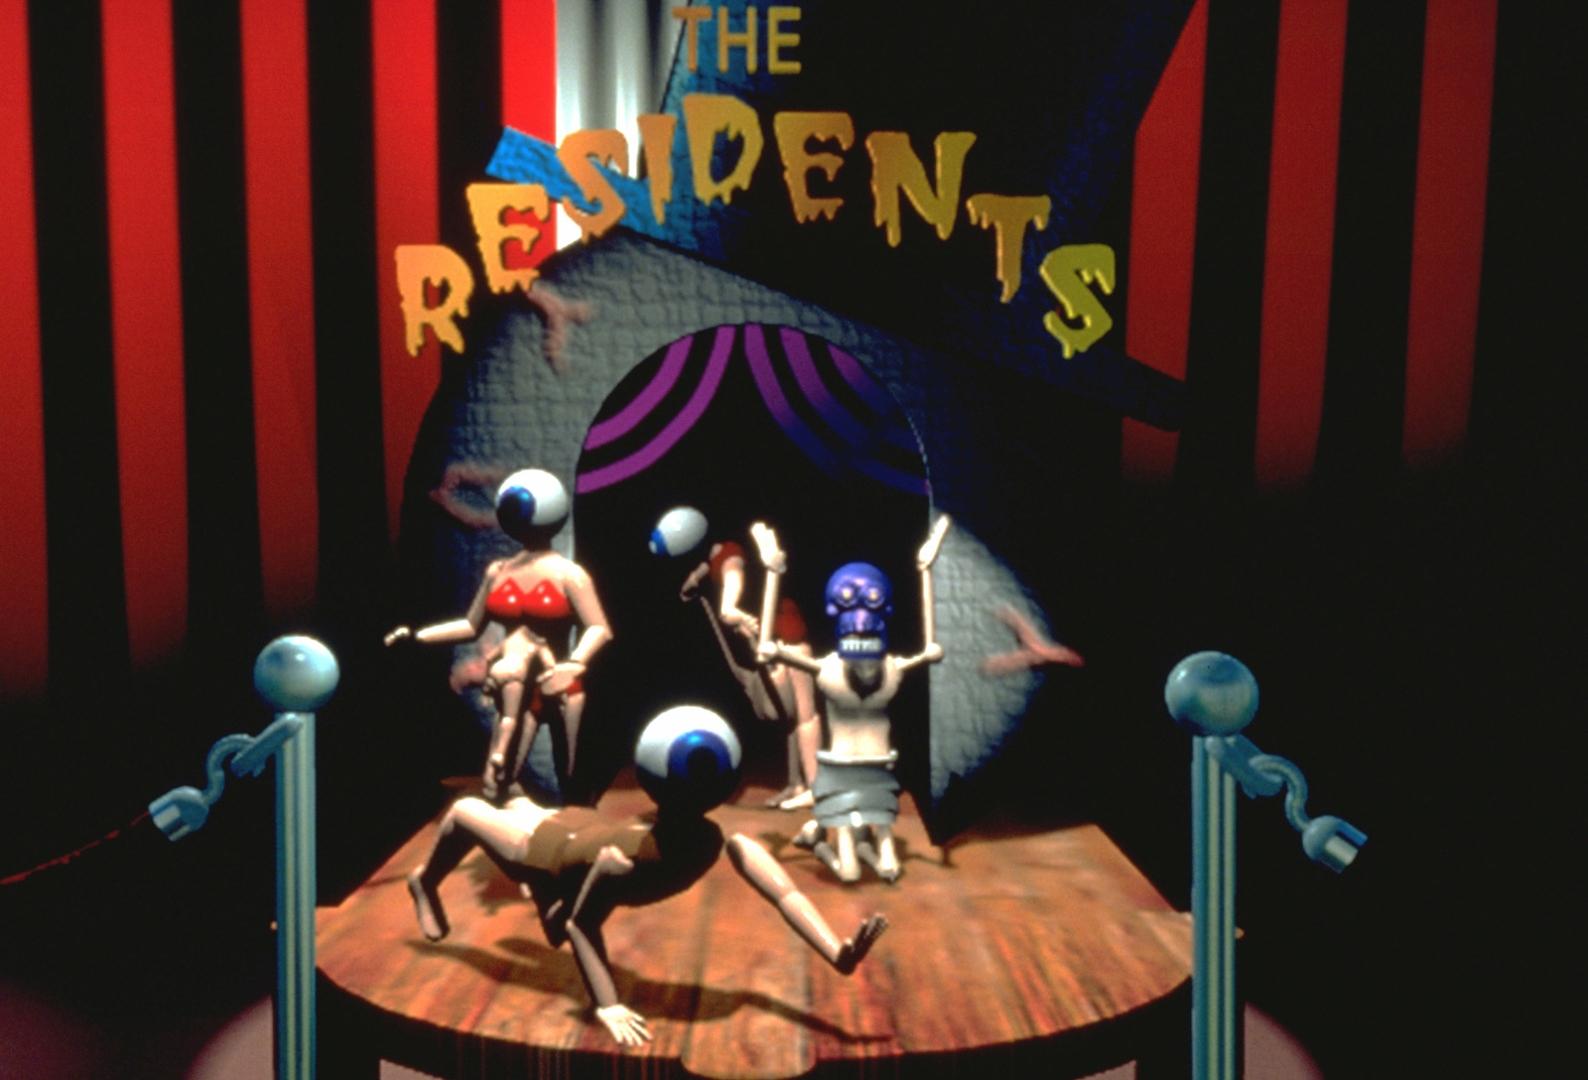 Freak Show. 1995 image